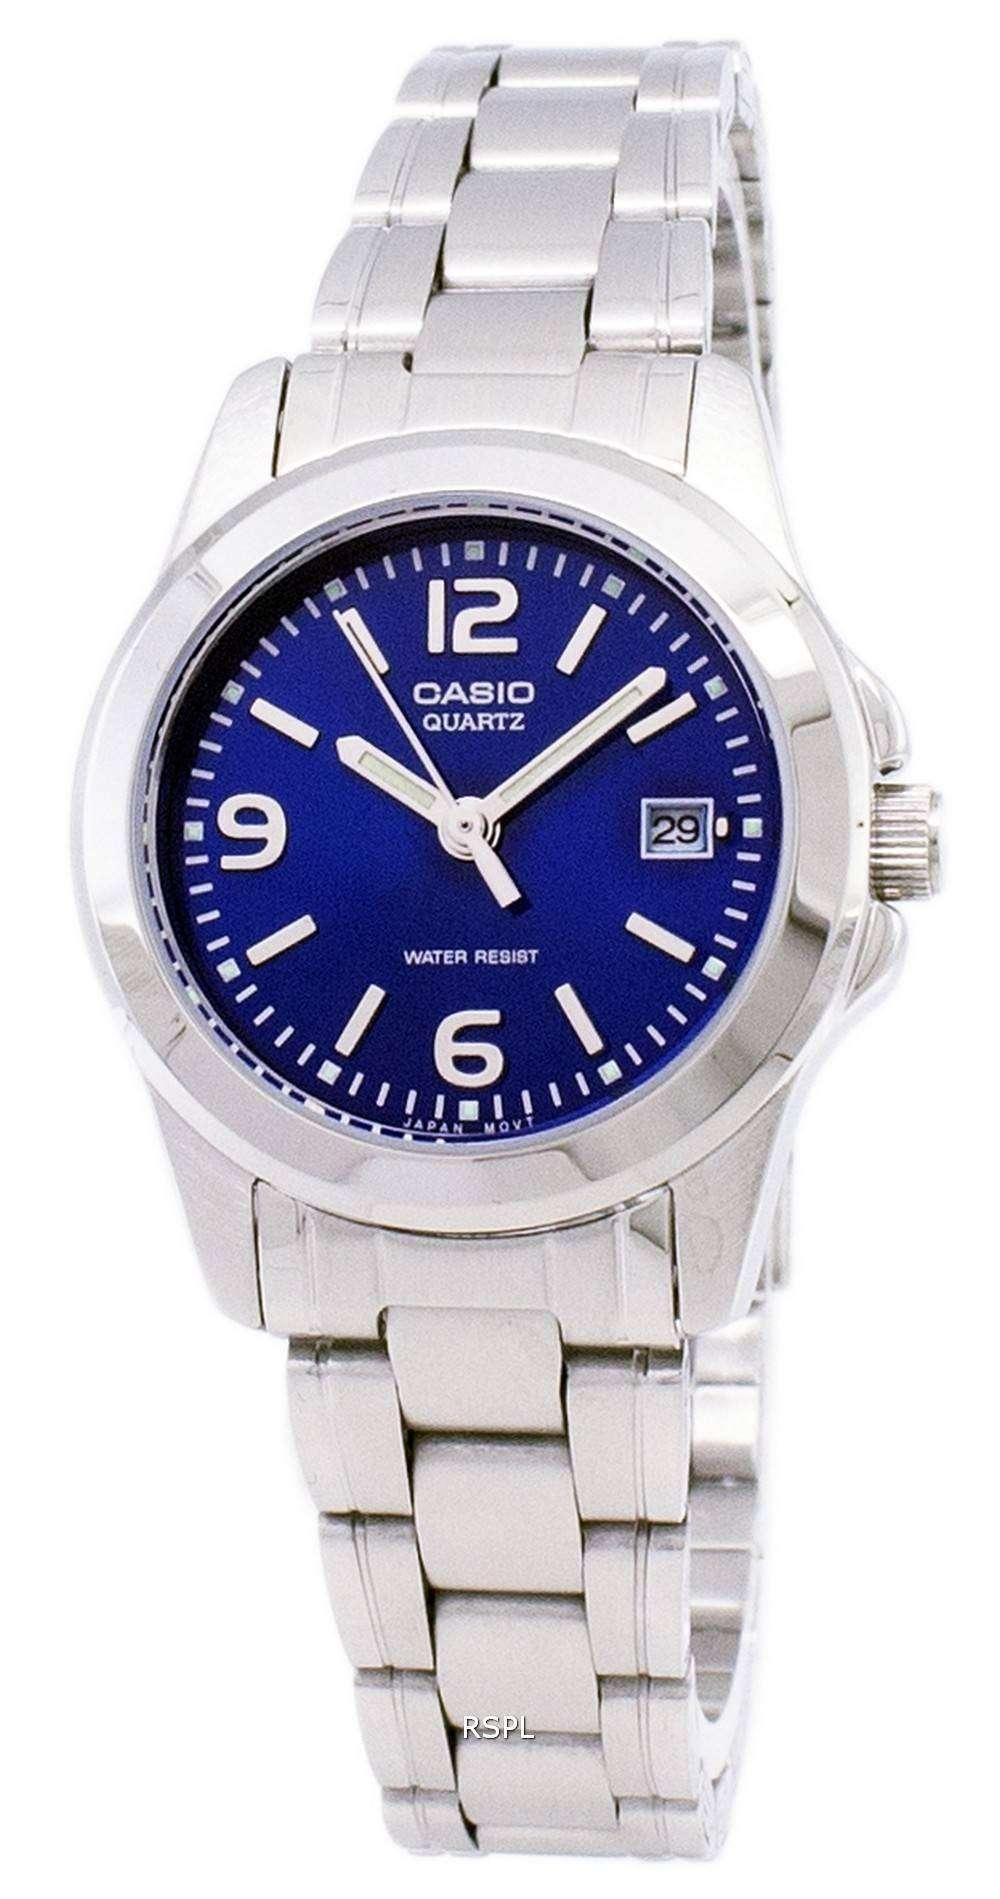 b0509c86b724 Reloj Casio analógico cuarzo Dial Azul LTP-1215A-2ADF LTP-1215A-2A ...